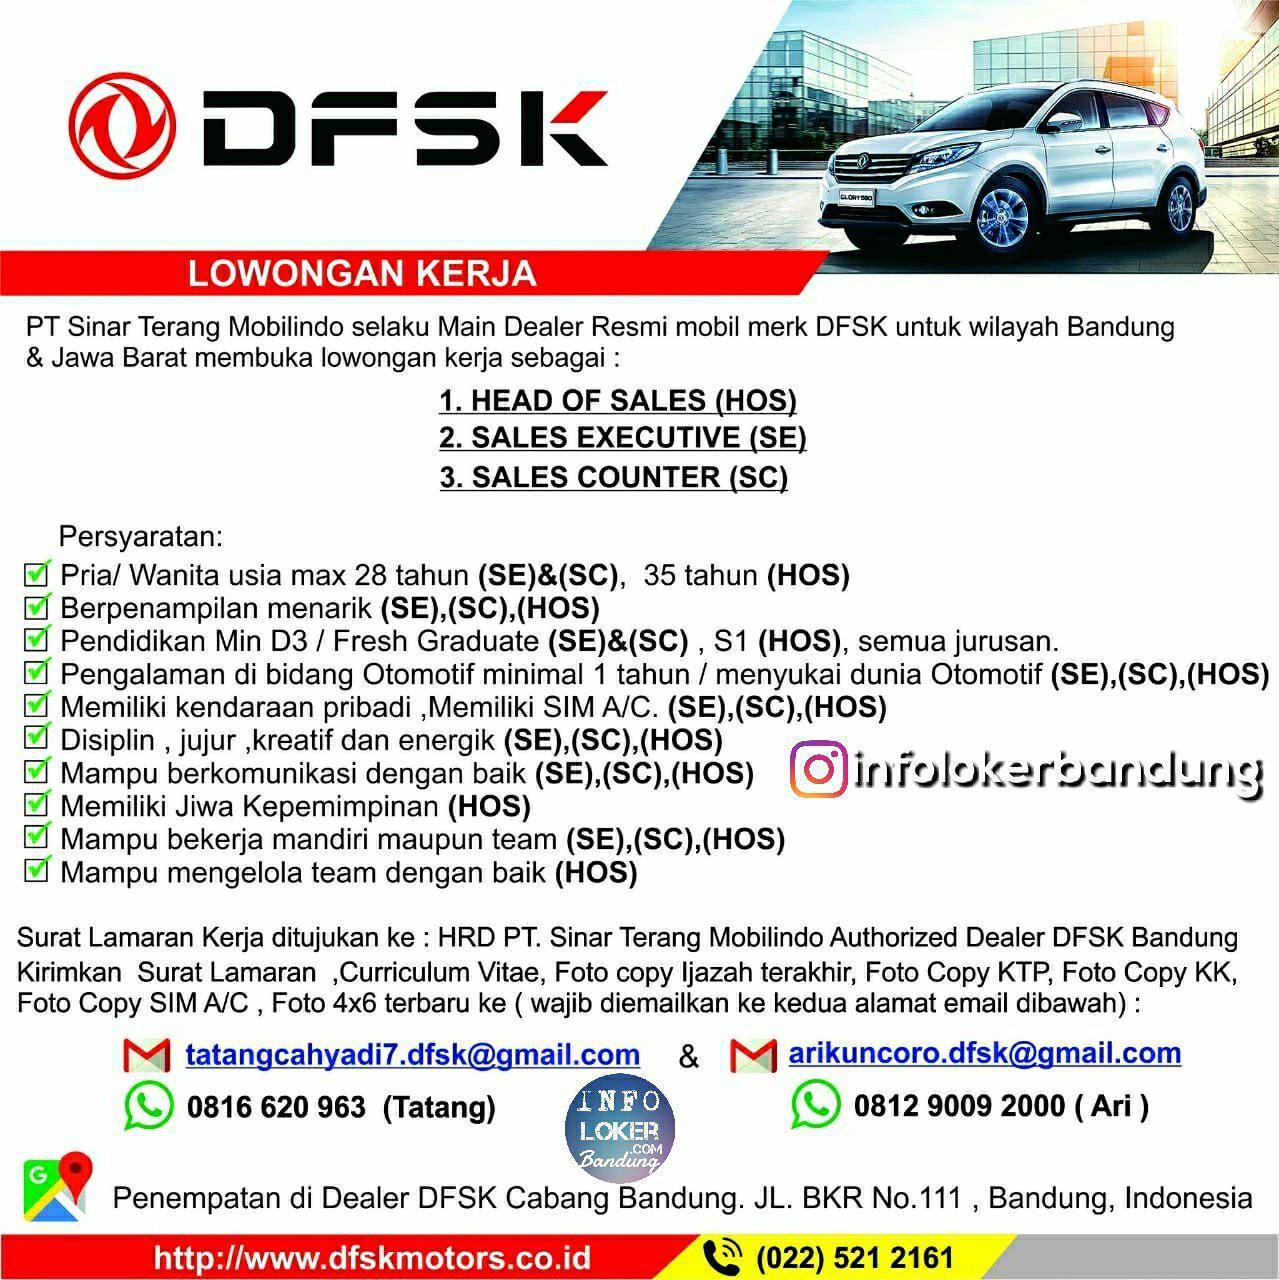 Lowongan Kerja PT. Sinar Terang Mobilindo ( DFSK Mobil ) Bandung Juli 2018 - infolokerbandung.com